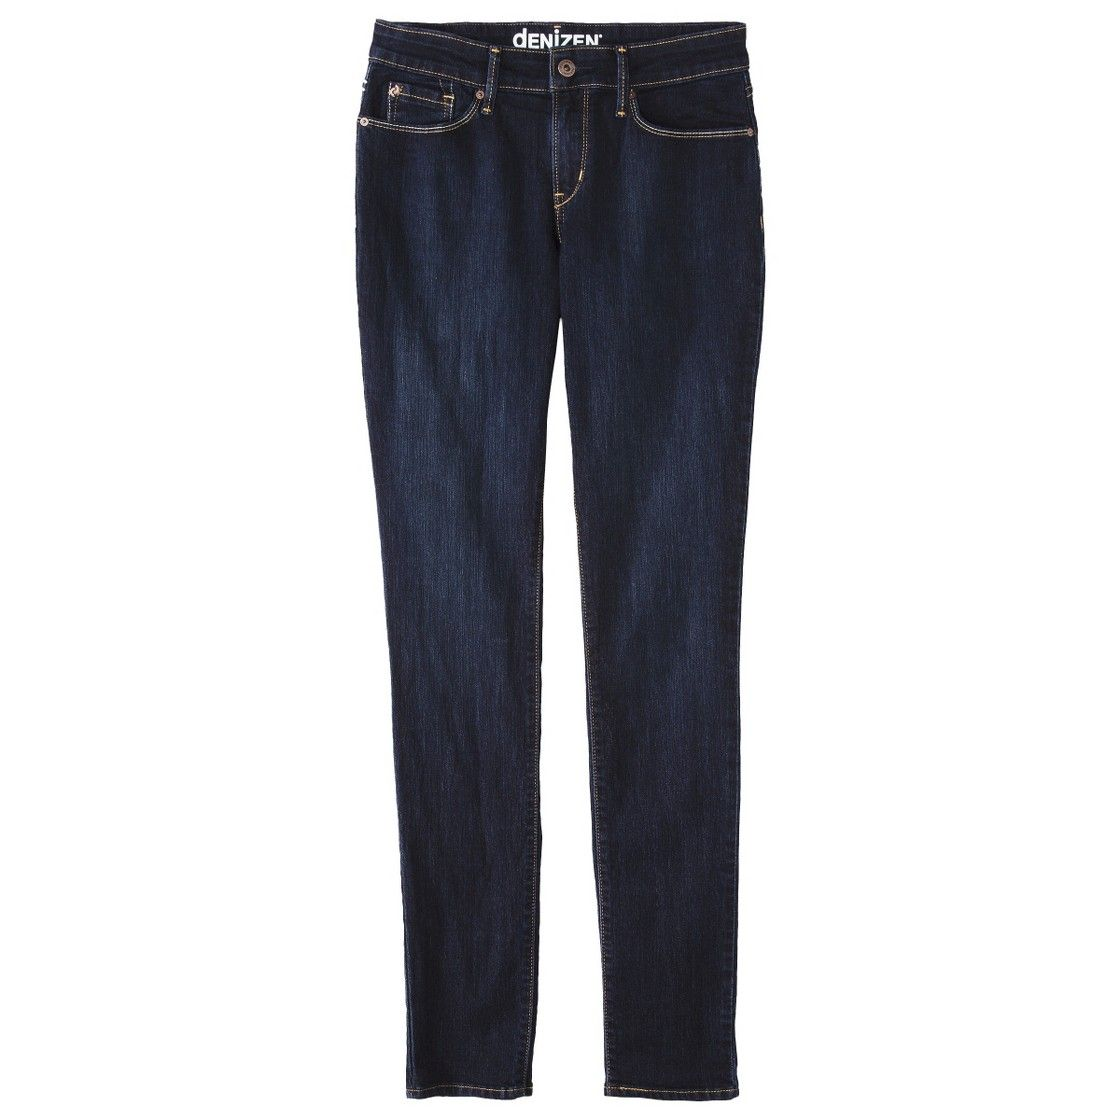 dENiZEN� Women's Essential Stretch Skinny Jean - Orbit